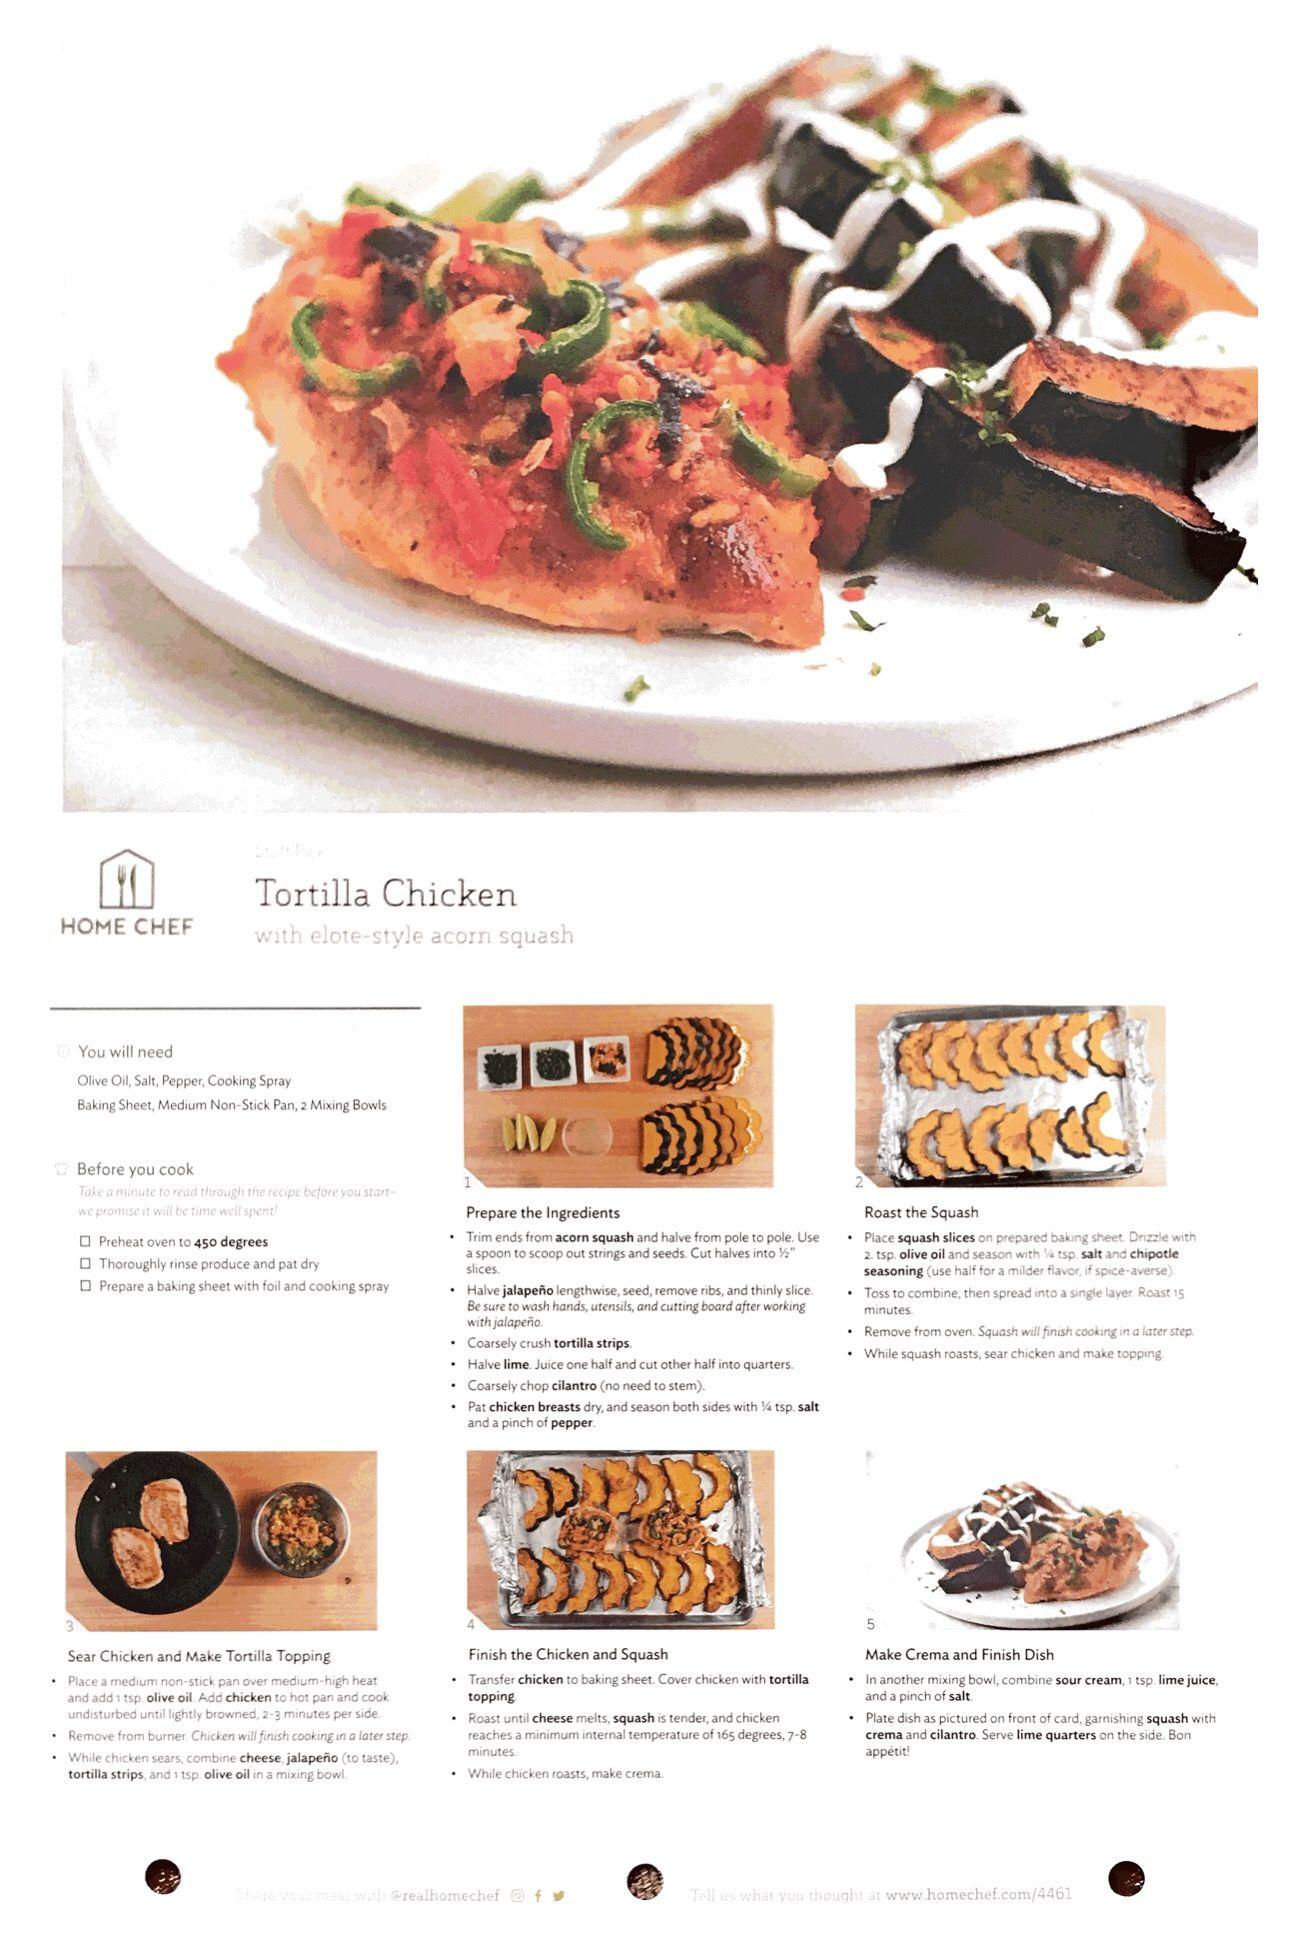 Tortilla Chicken With Elote Style Acorn Squash Acorn Squash